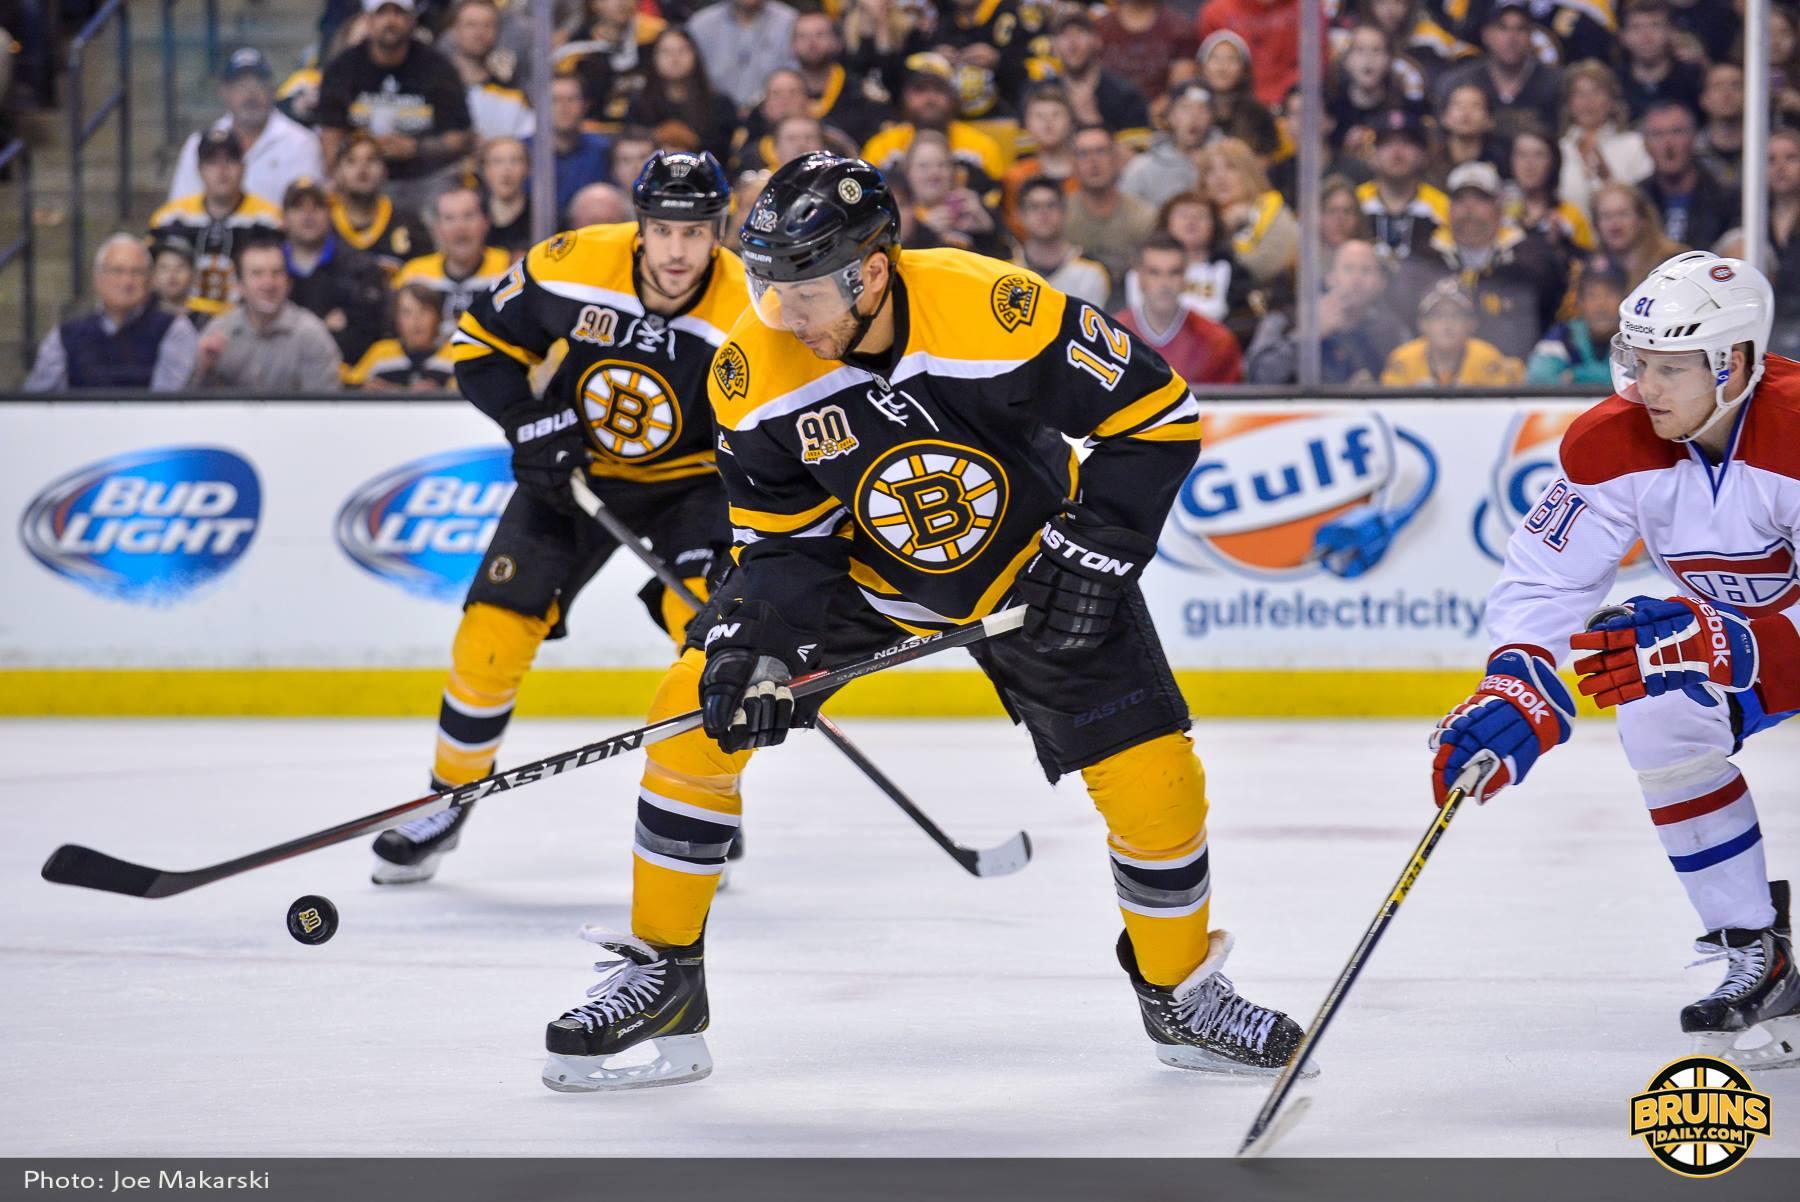 Off-season of decisions awaits Bruins - Bruins Daily ...Bruins Hockey